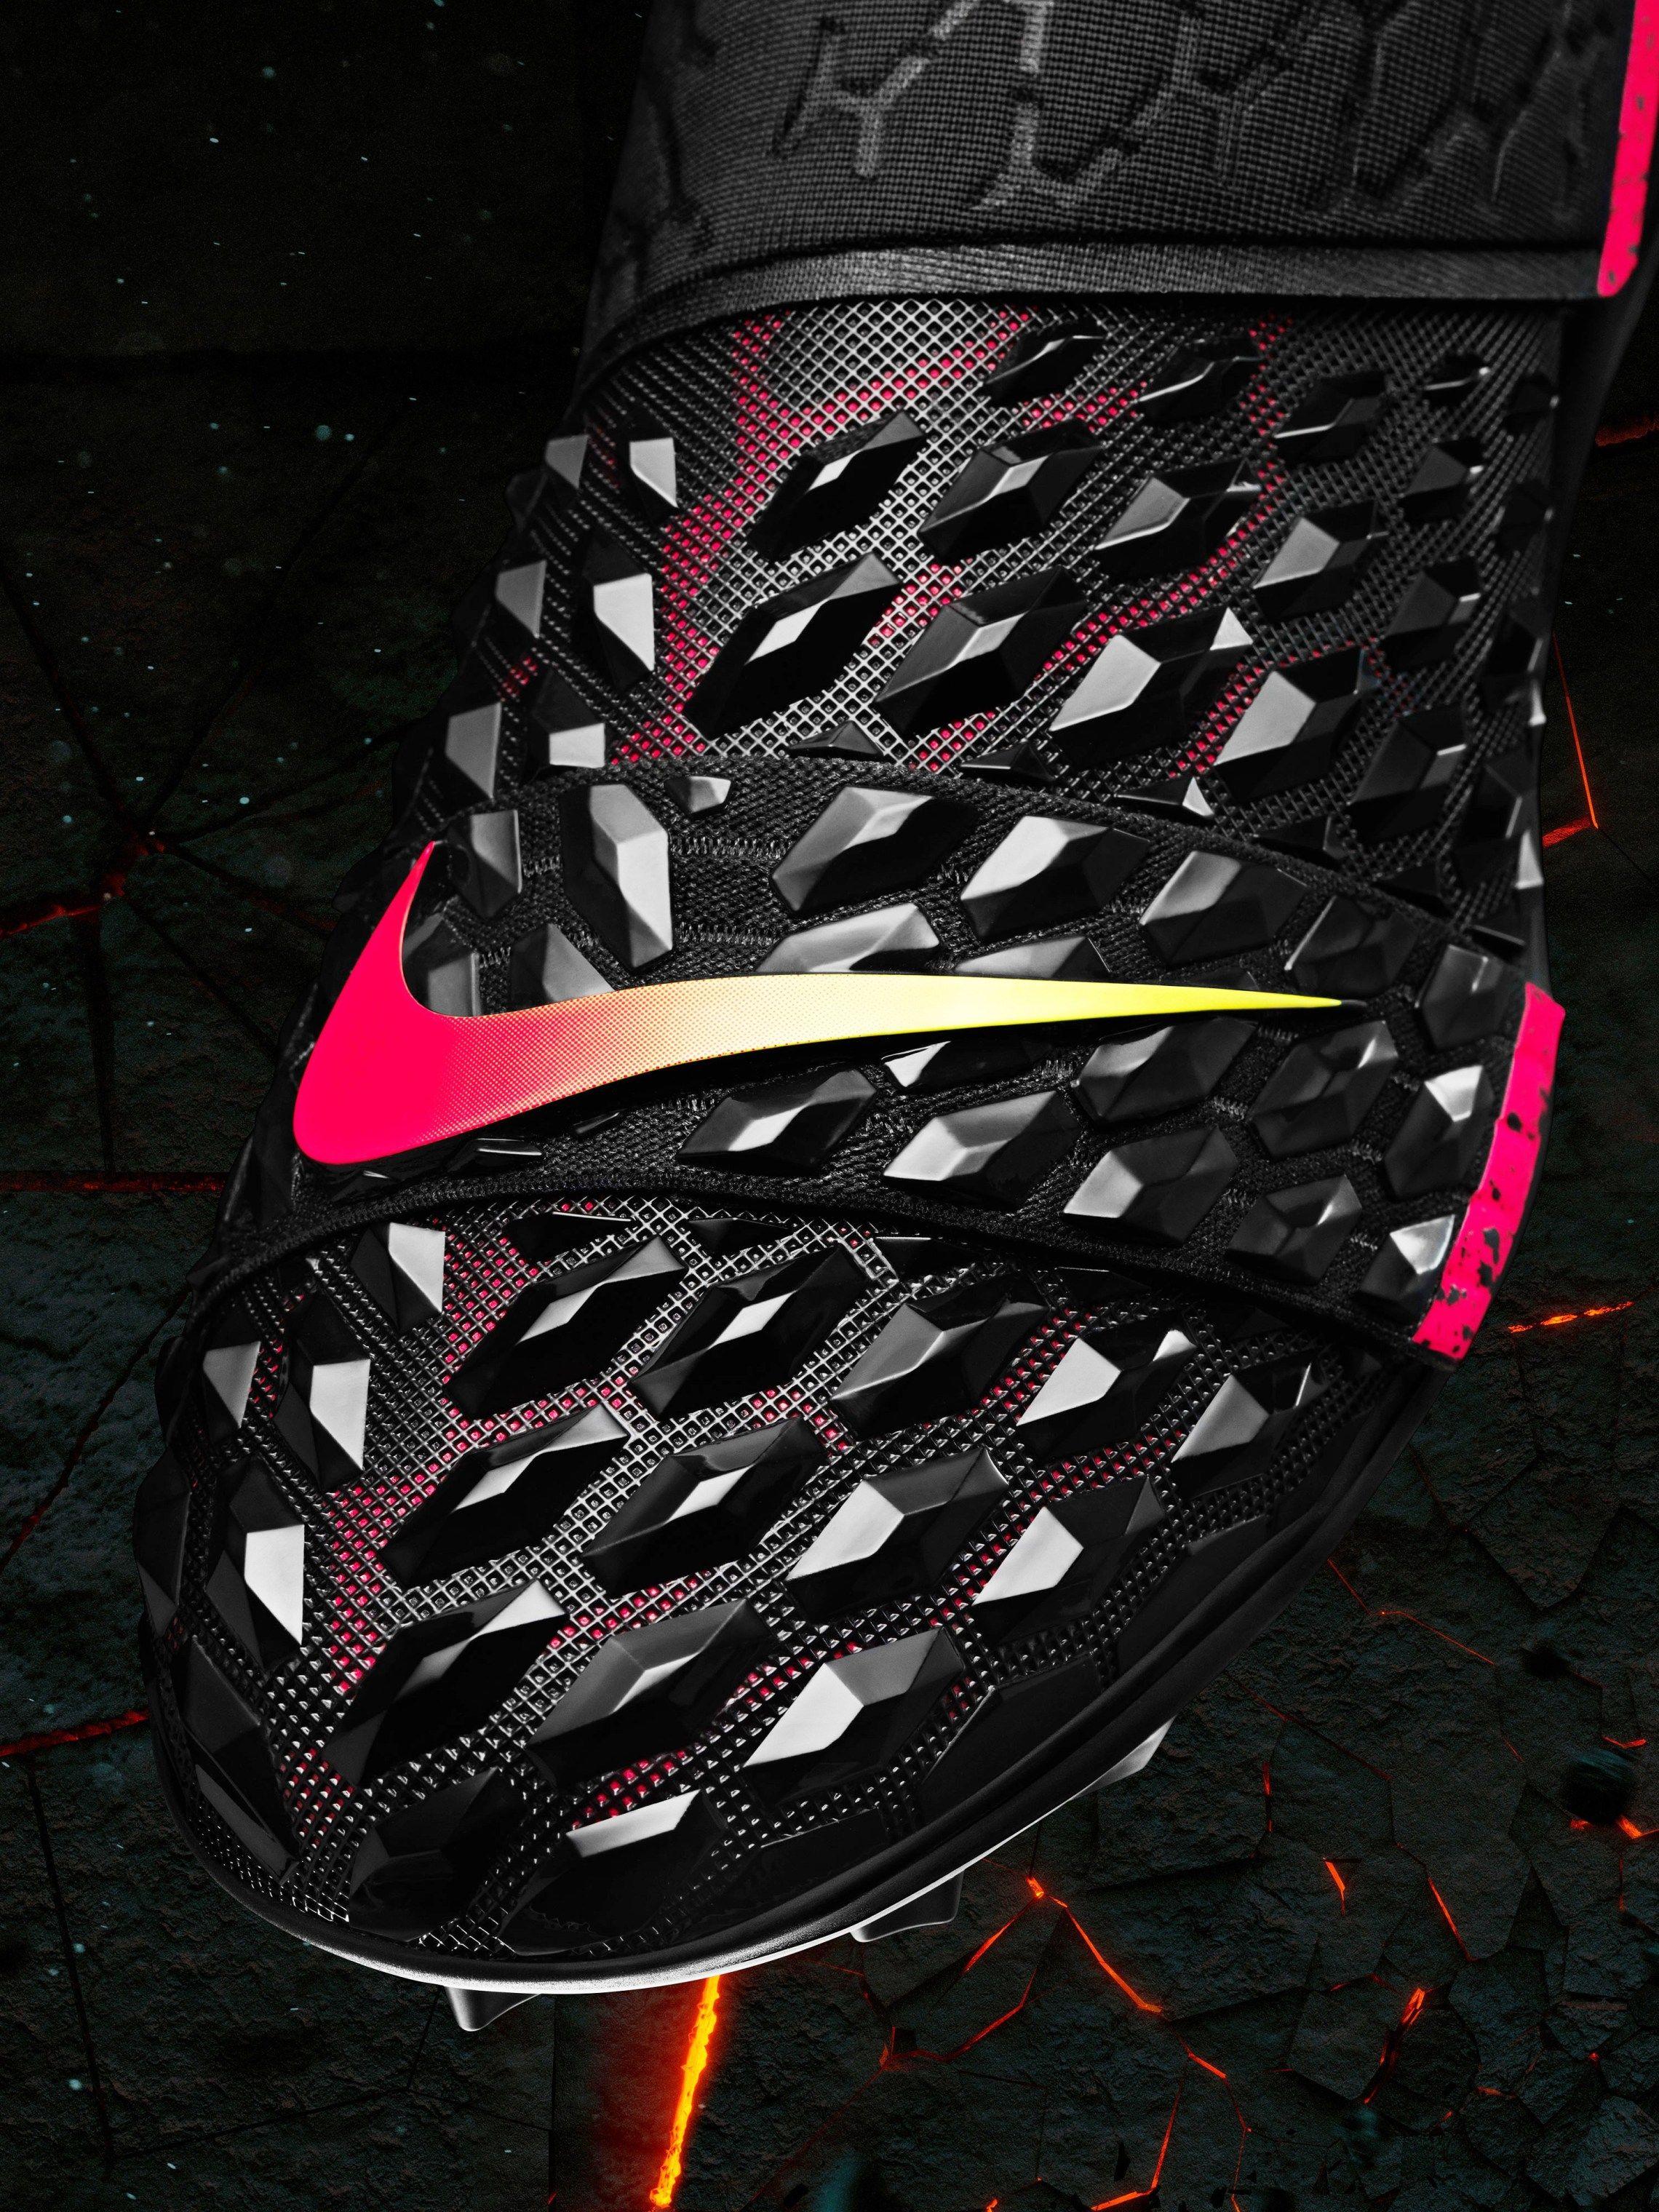 cheaper e4d47 50321 How LeBron James Inspired Khalil Mack s New Nike Football Cleats   Nice  Kicks